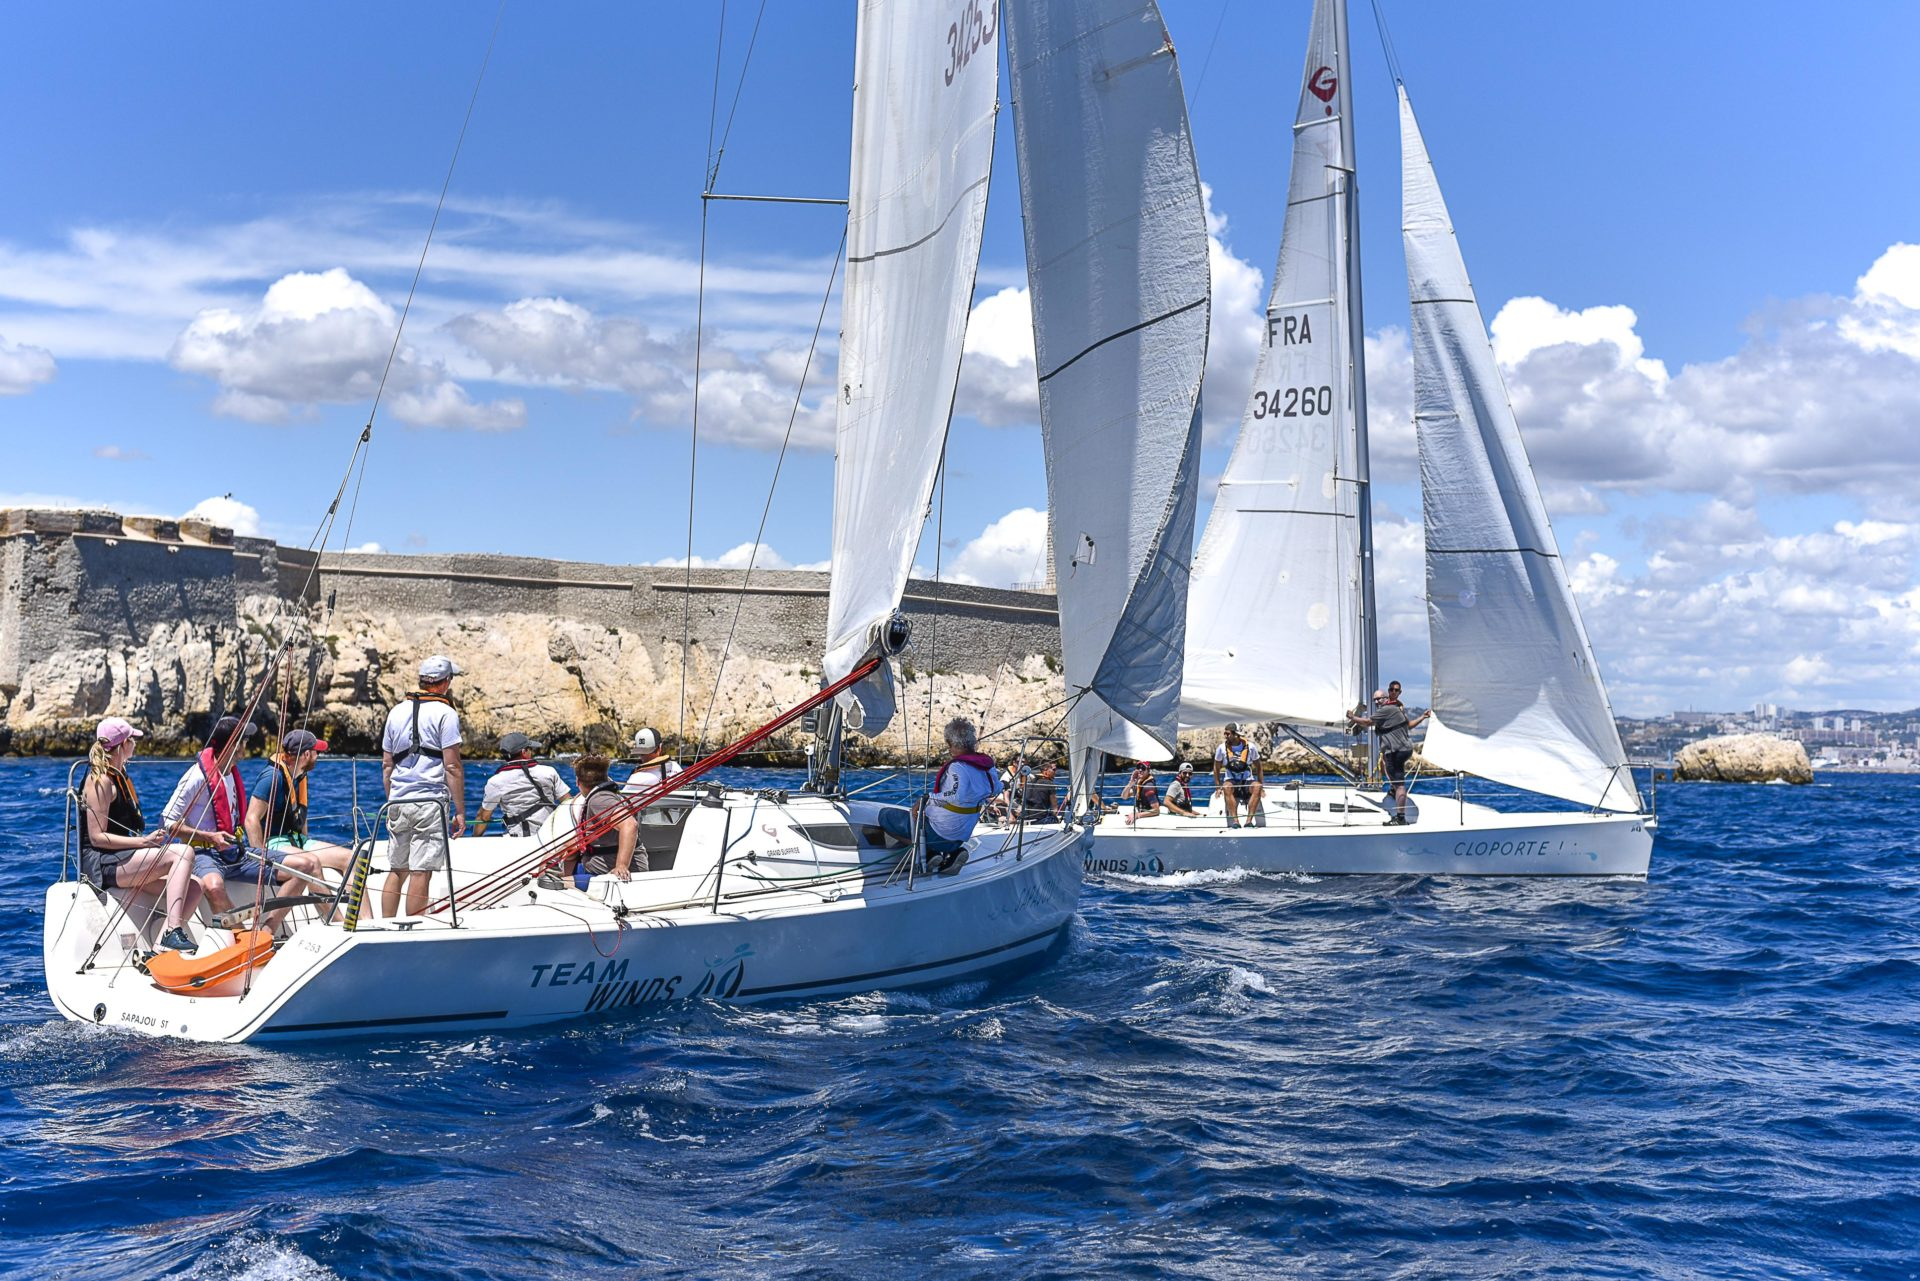 team winds - 349